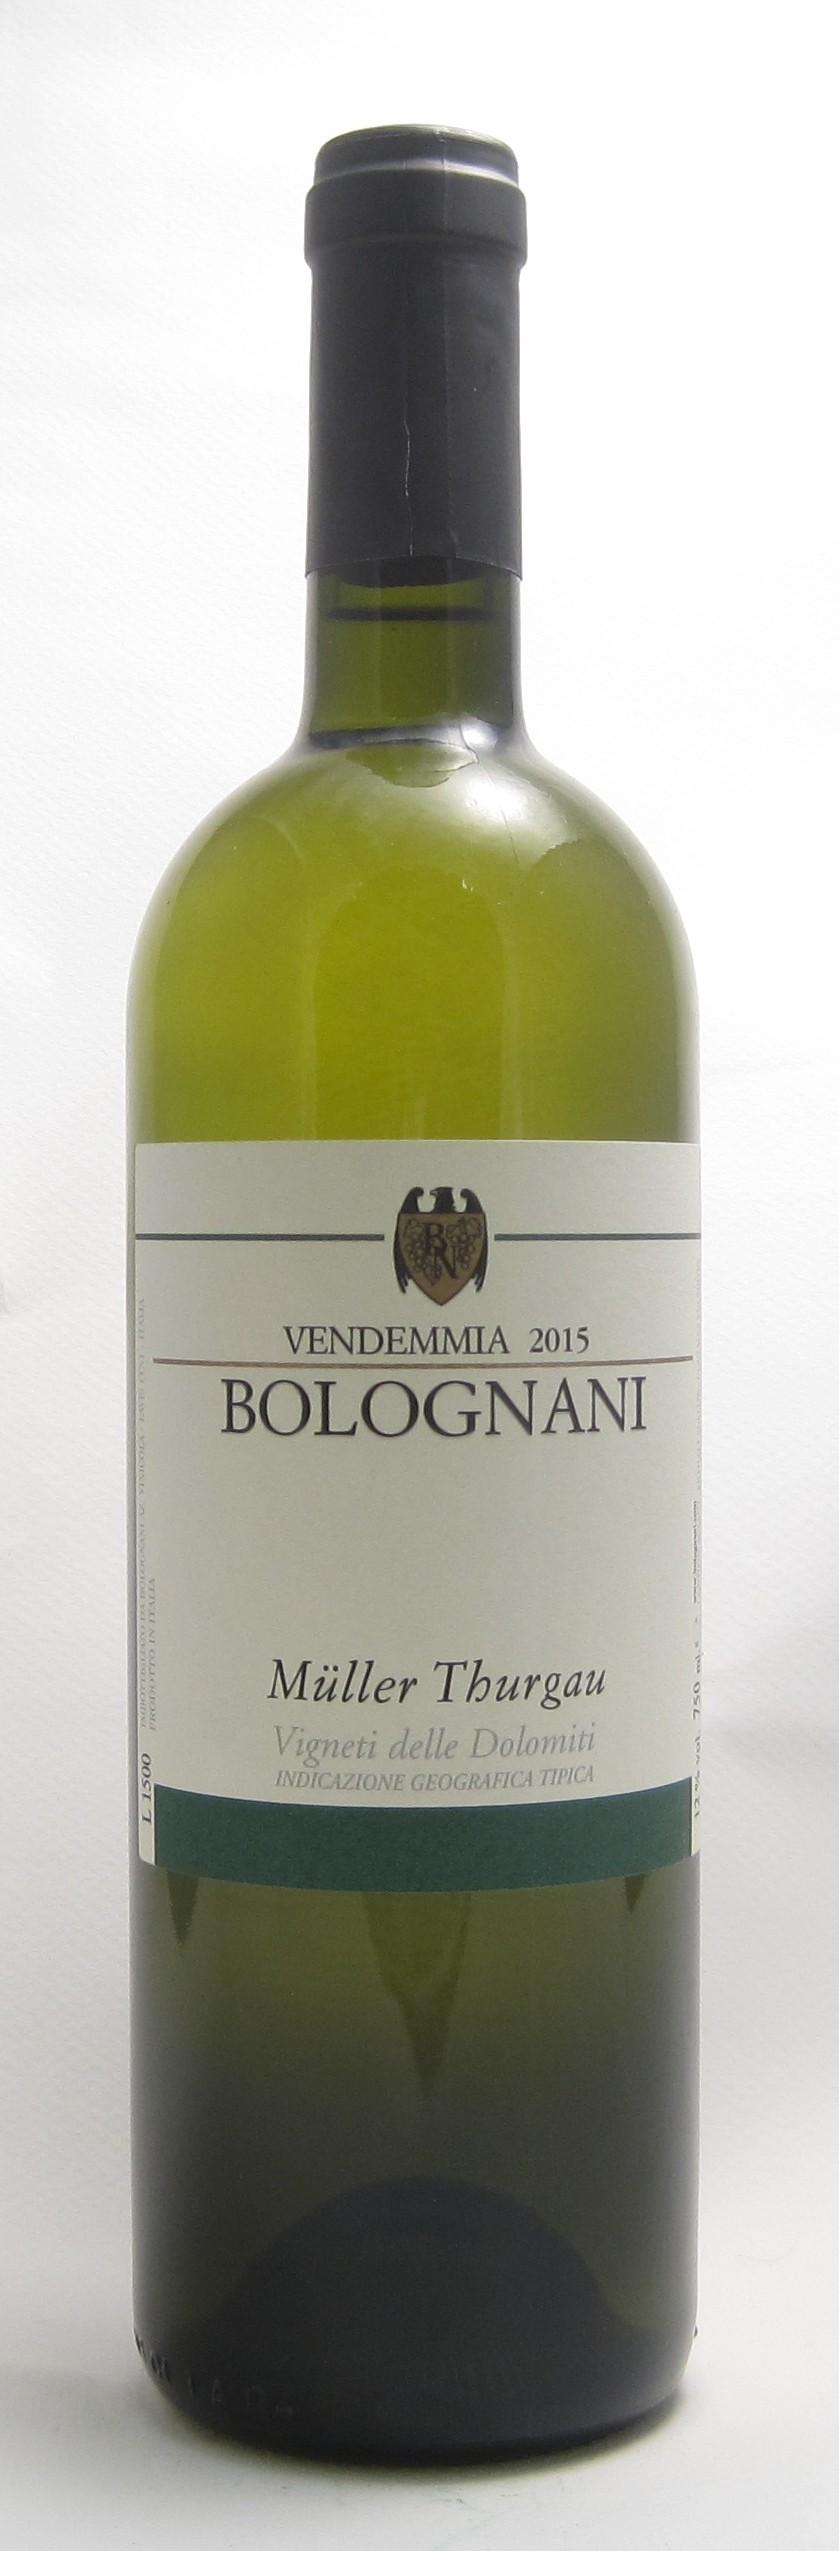 Bolognani Muller Thurgau